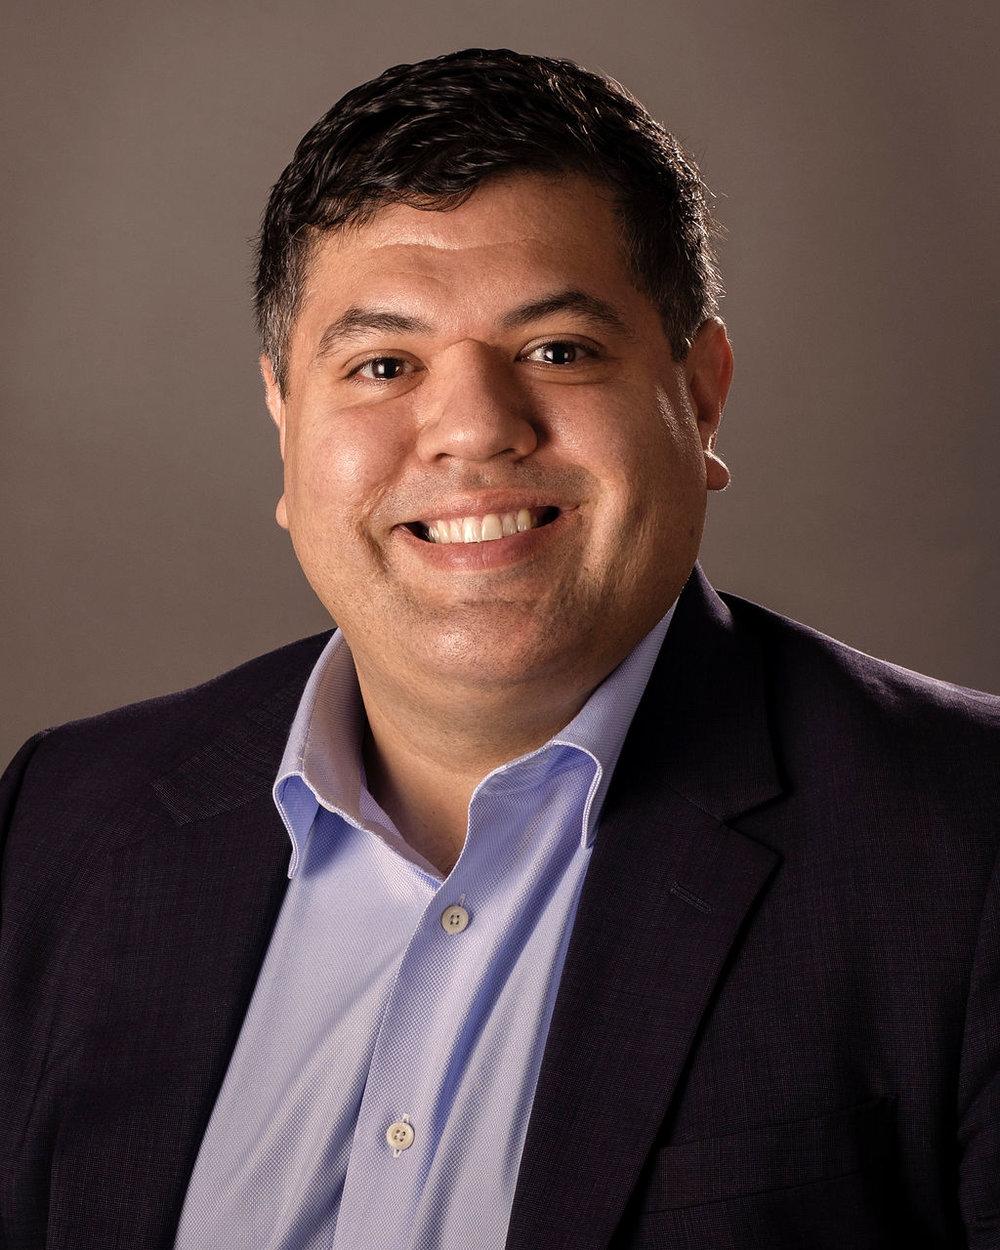 David Molina